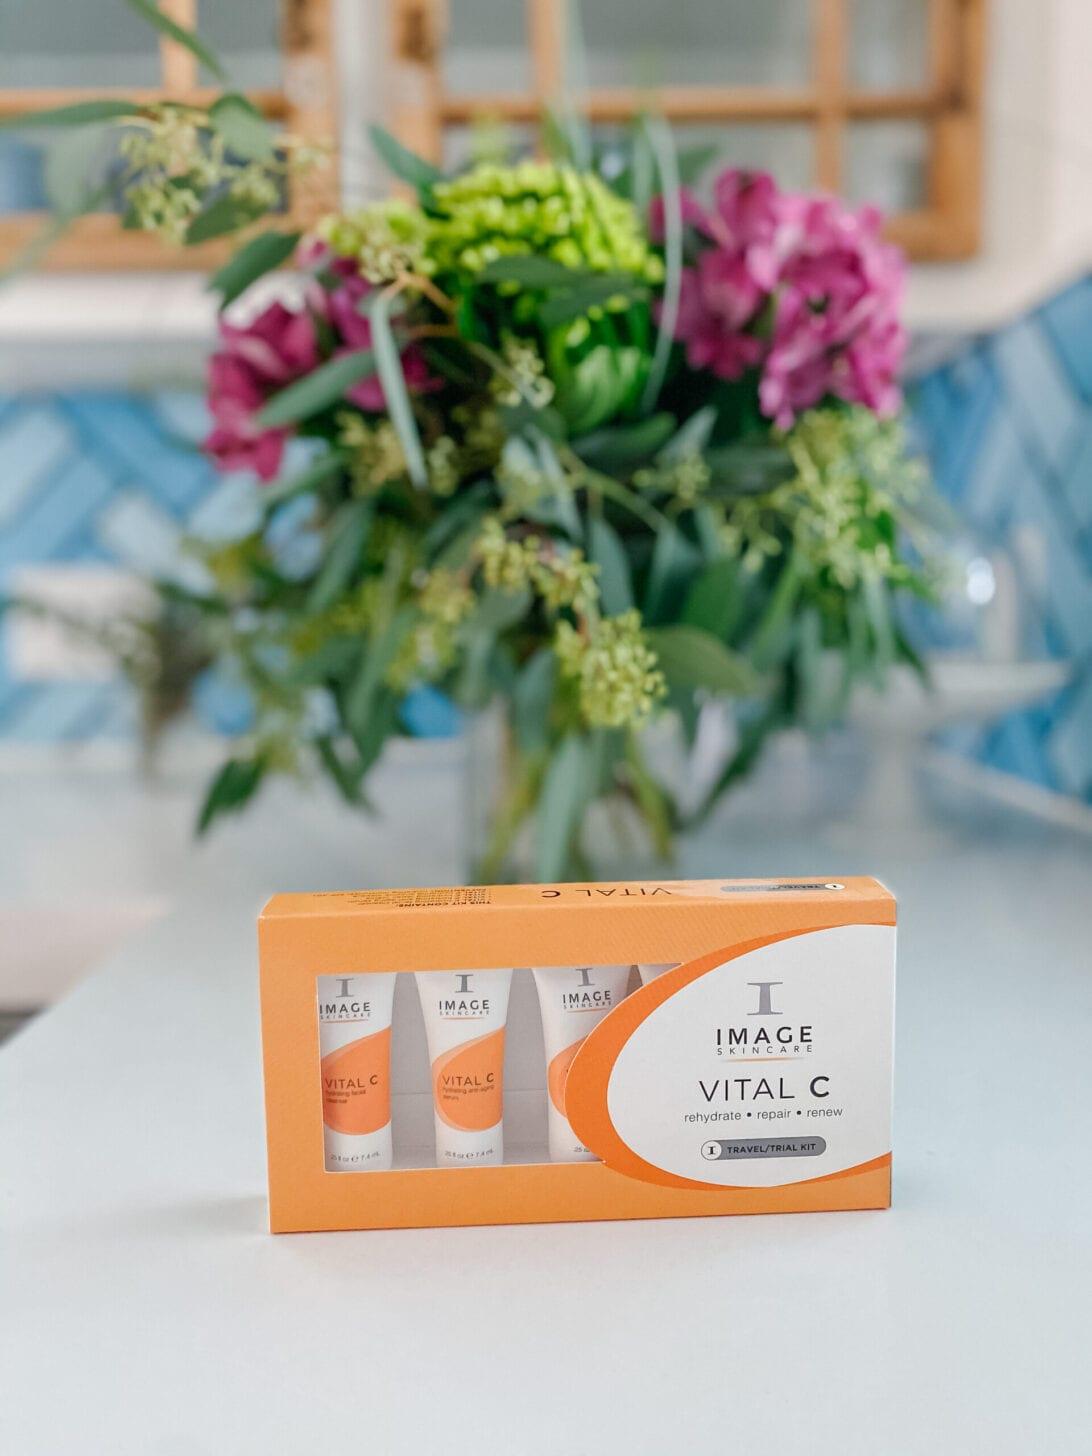 IMAGE SKINCARE VITAL C TRAVEL KIT, WALMART, Fall Skincare Essentials